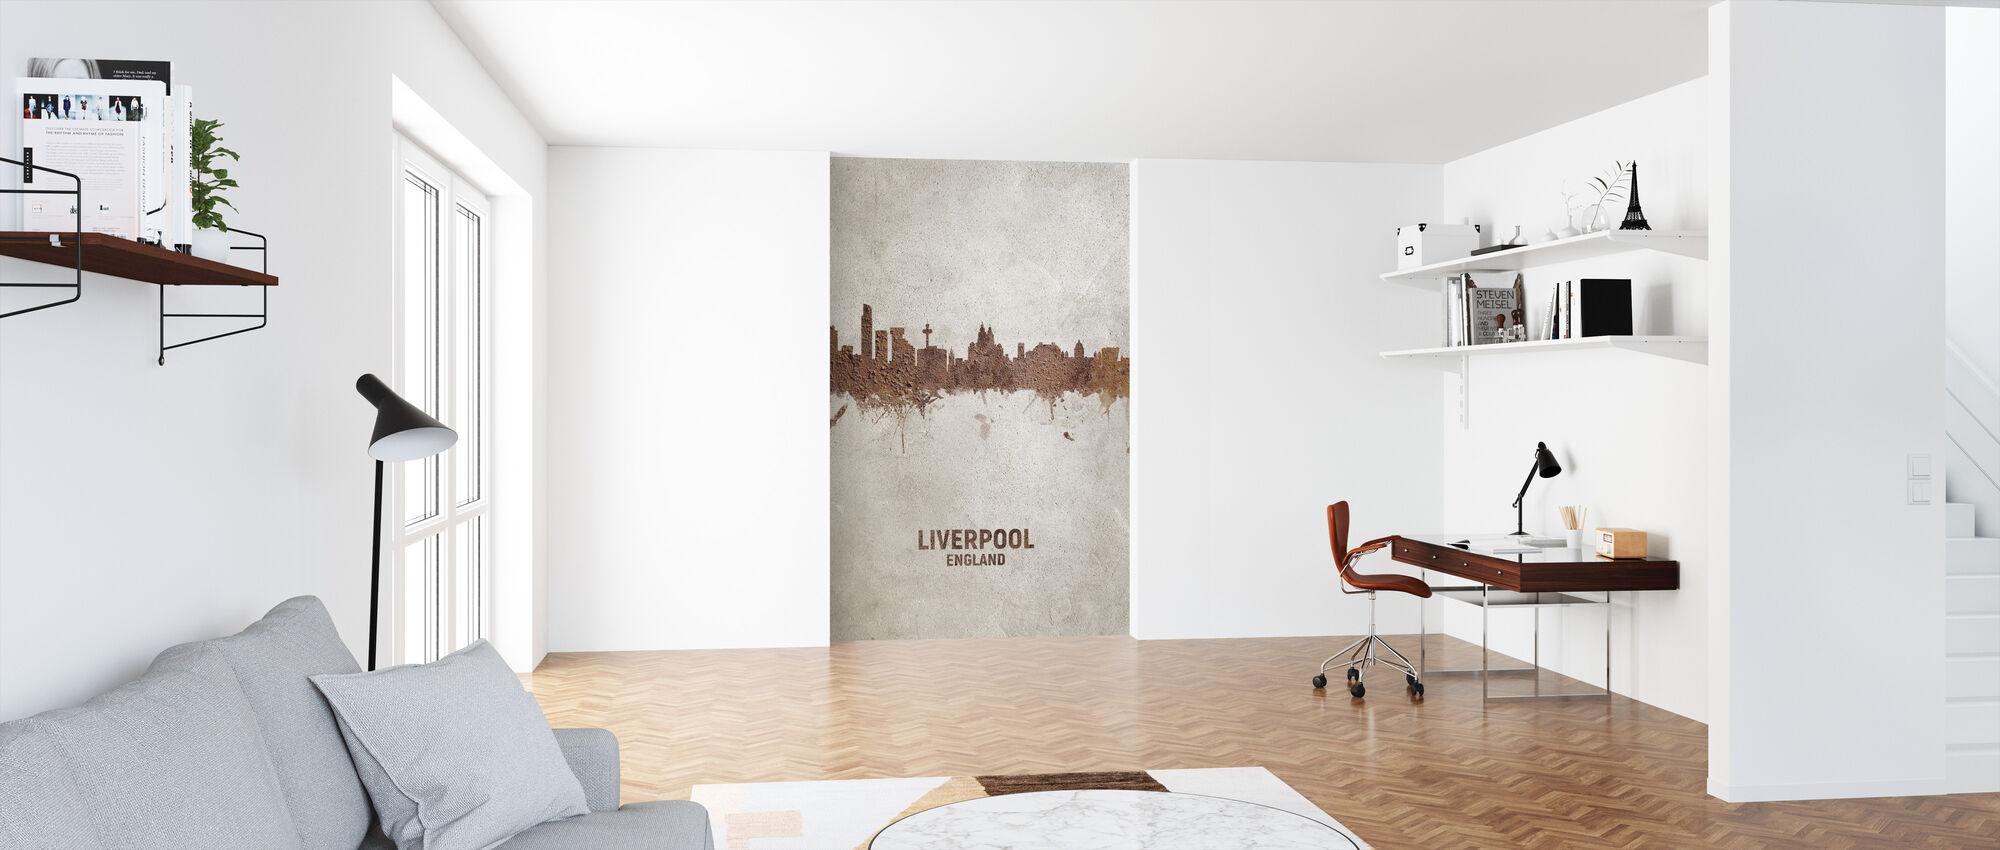 Liverpool England Rust Skyline - Wallpaper - Office